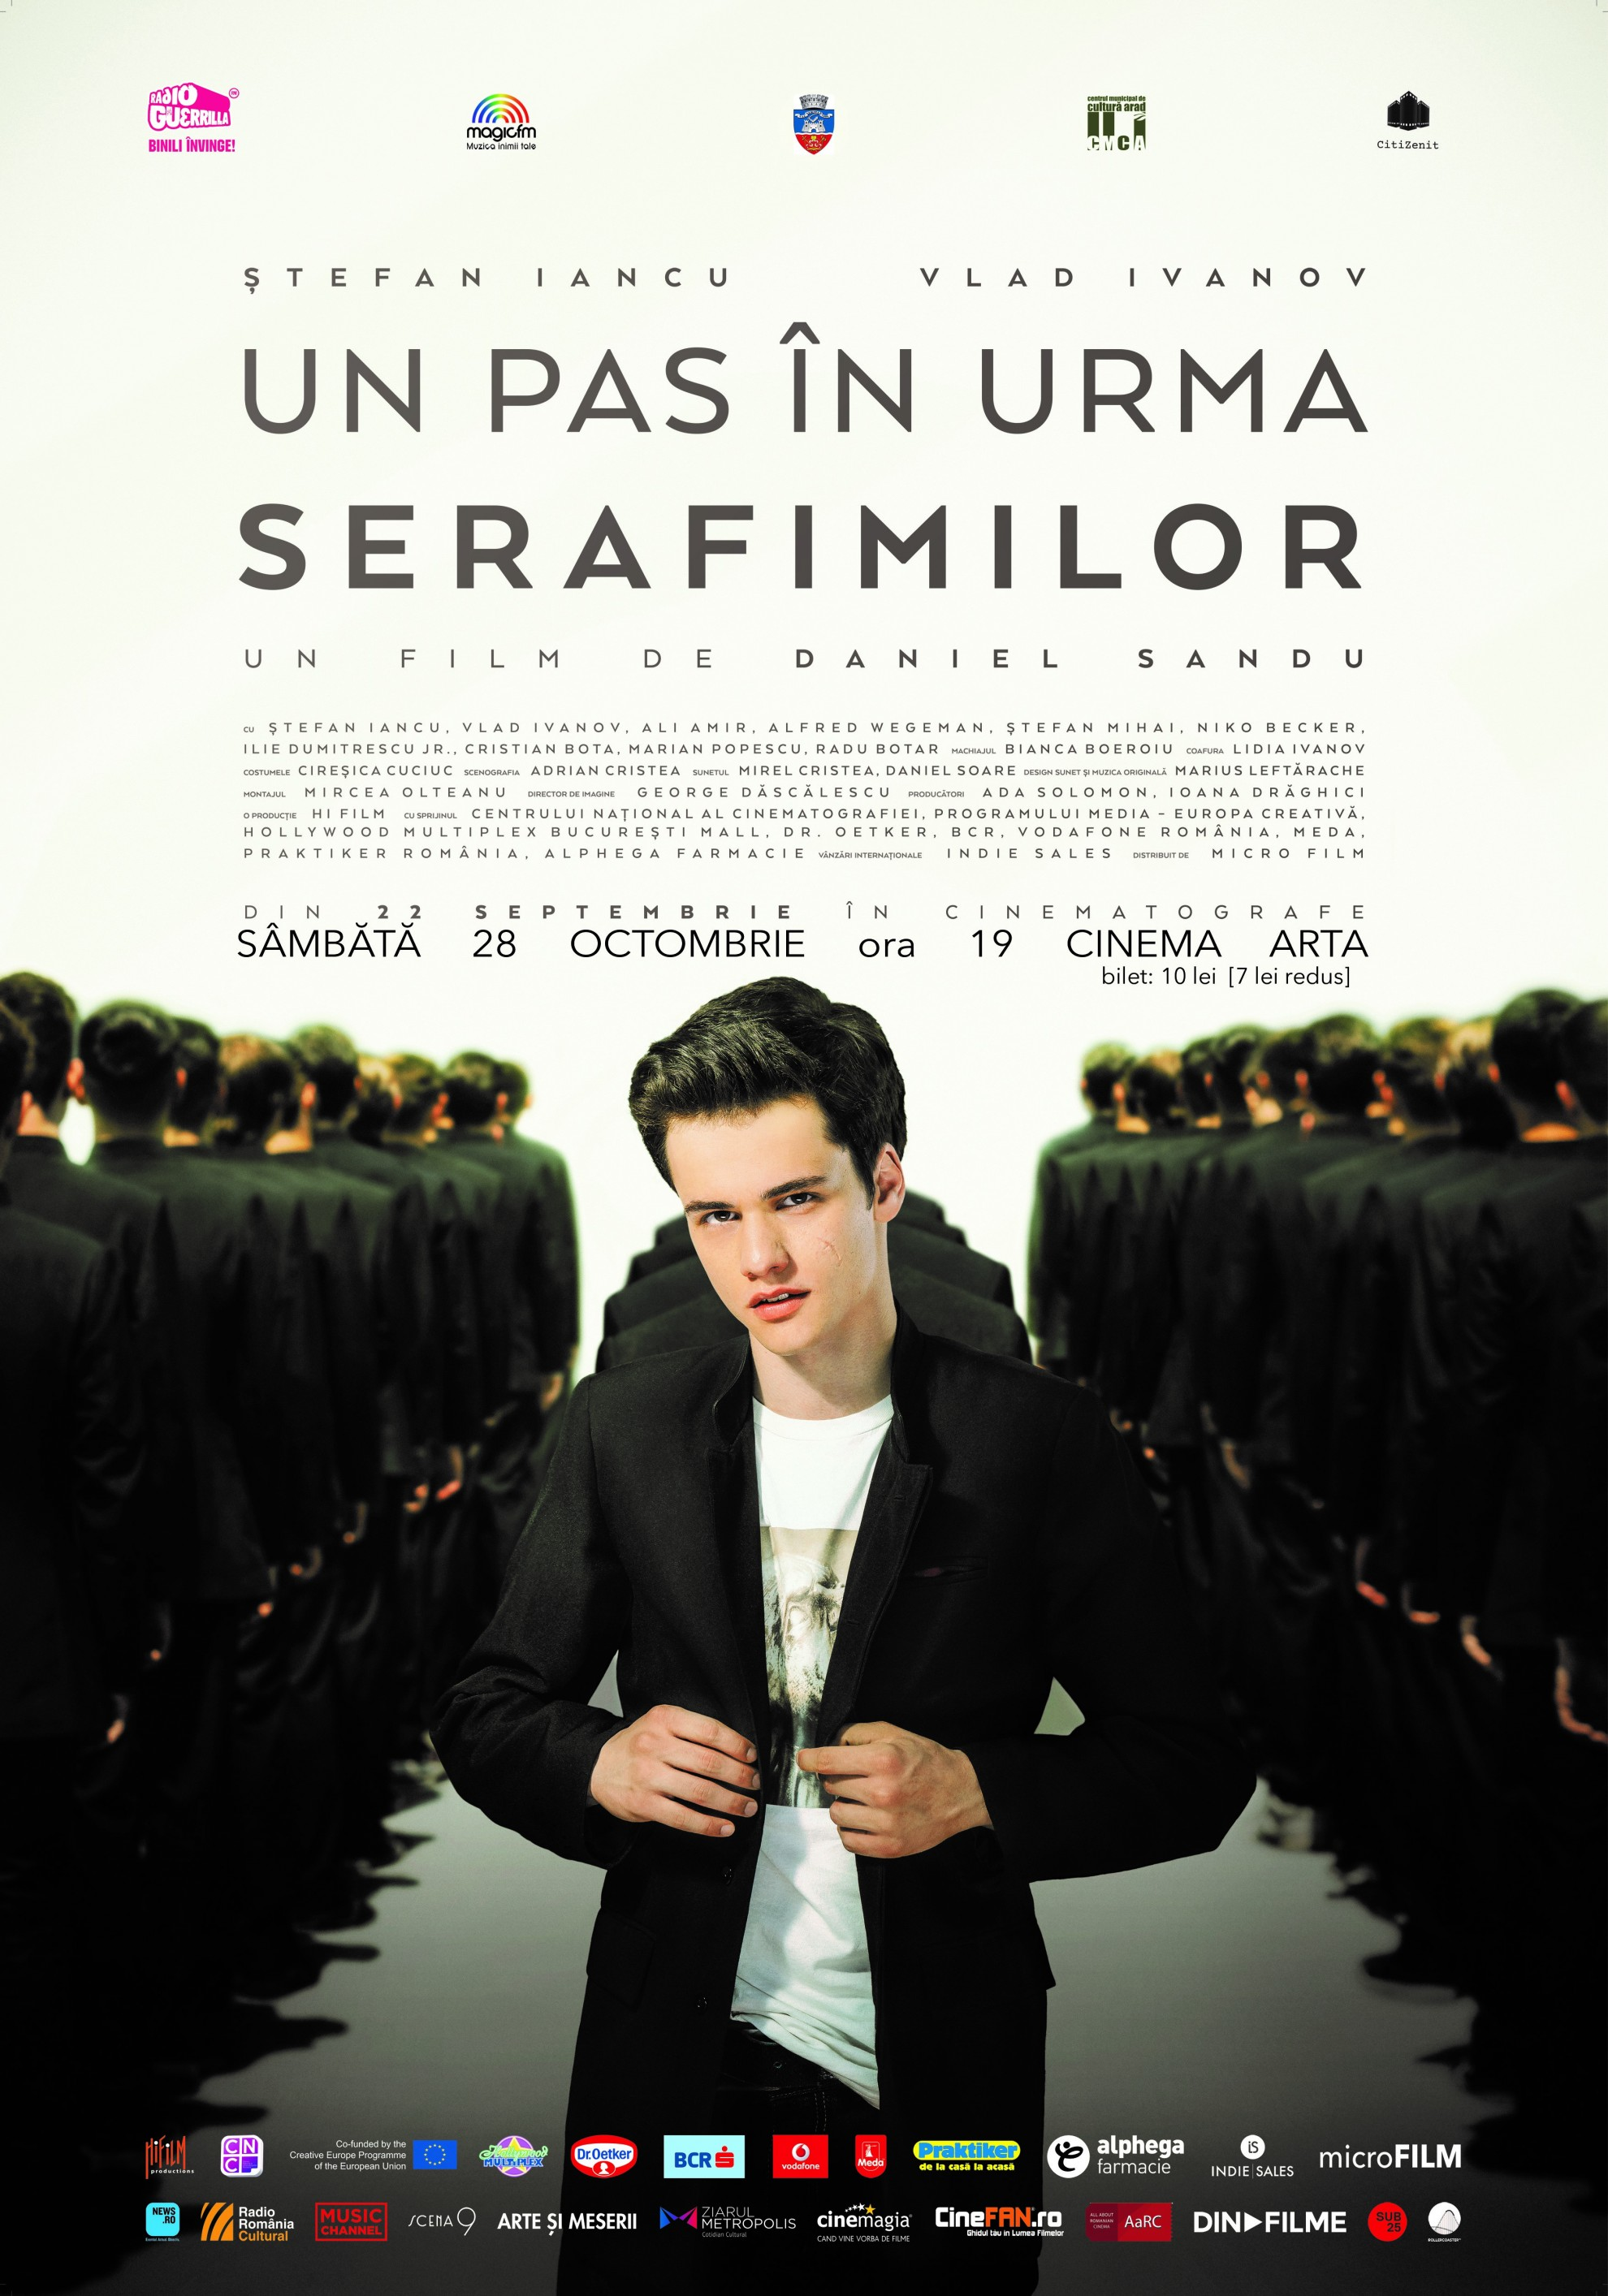 """One step after seraphim"" - at Cinema Arta"